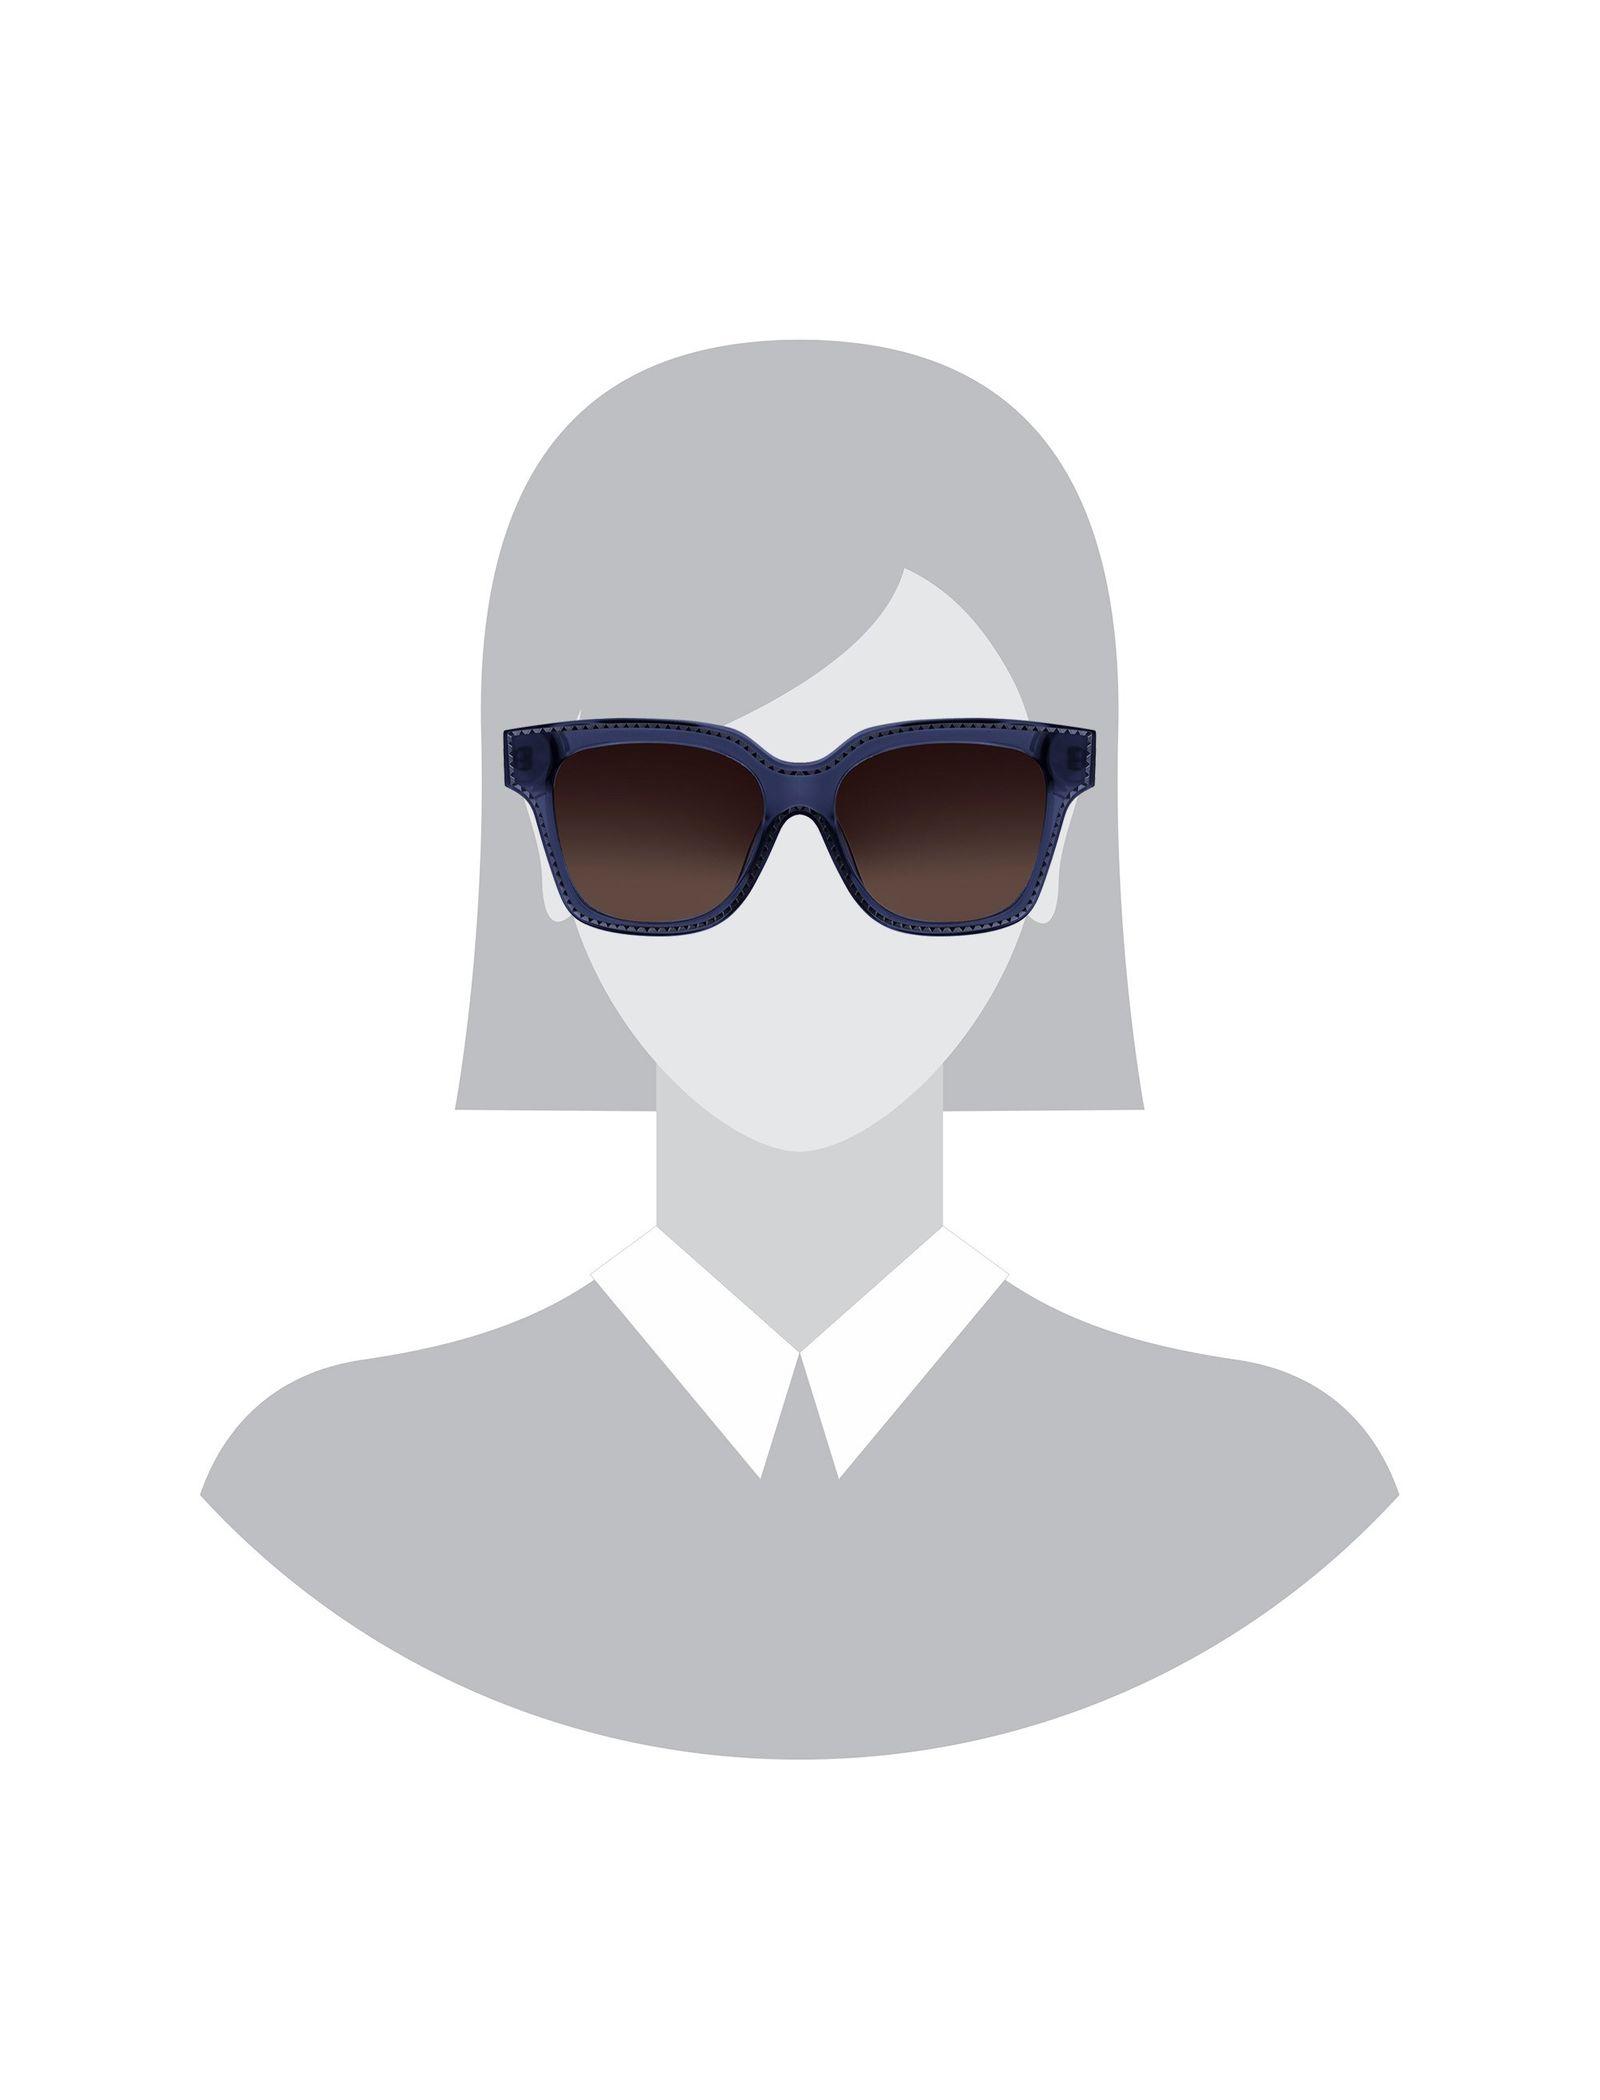 عینک آفتابی ویفرر زنانه - کریستین لاکروآ - آبي - 4